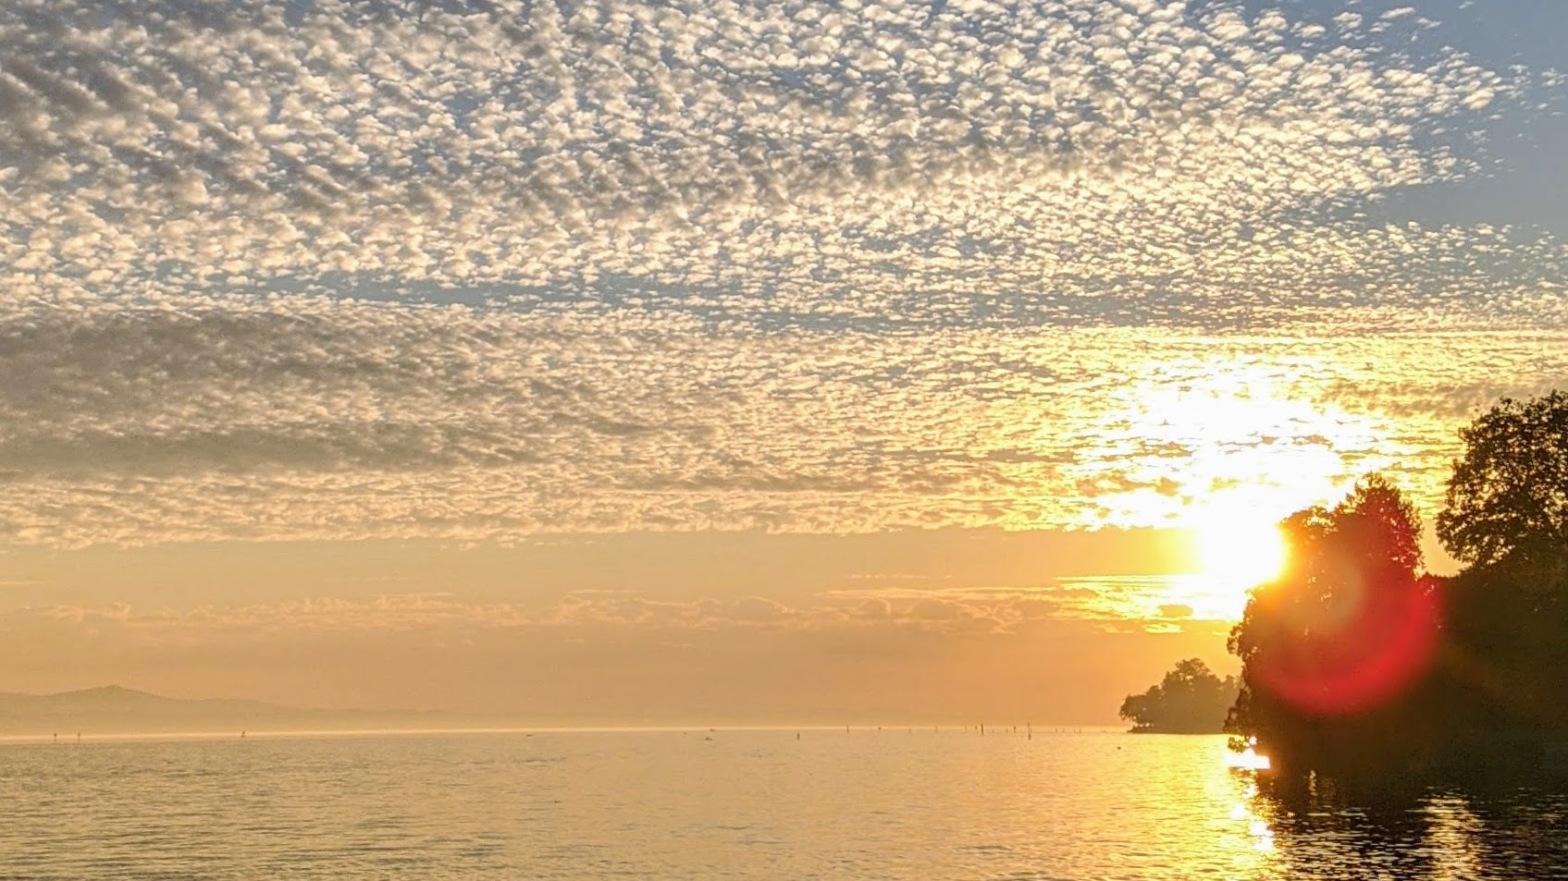 Orange sunset over lake constance